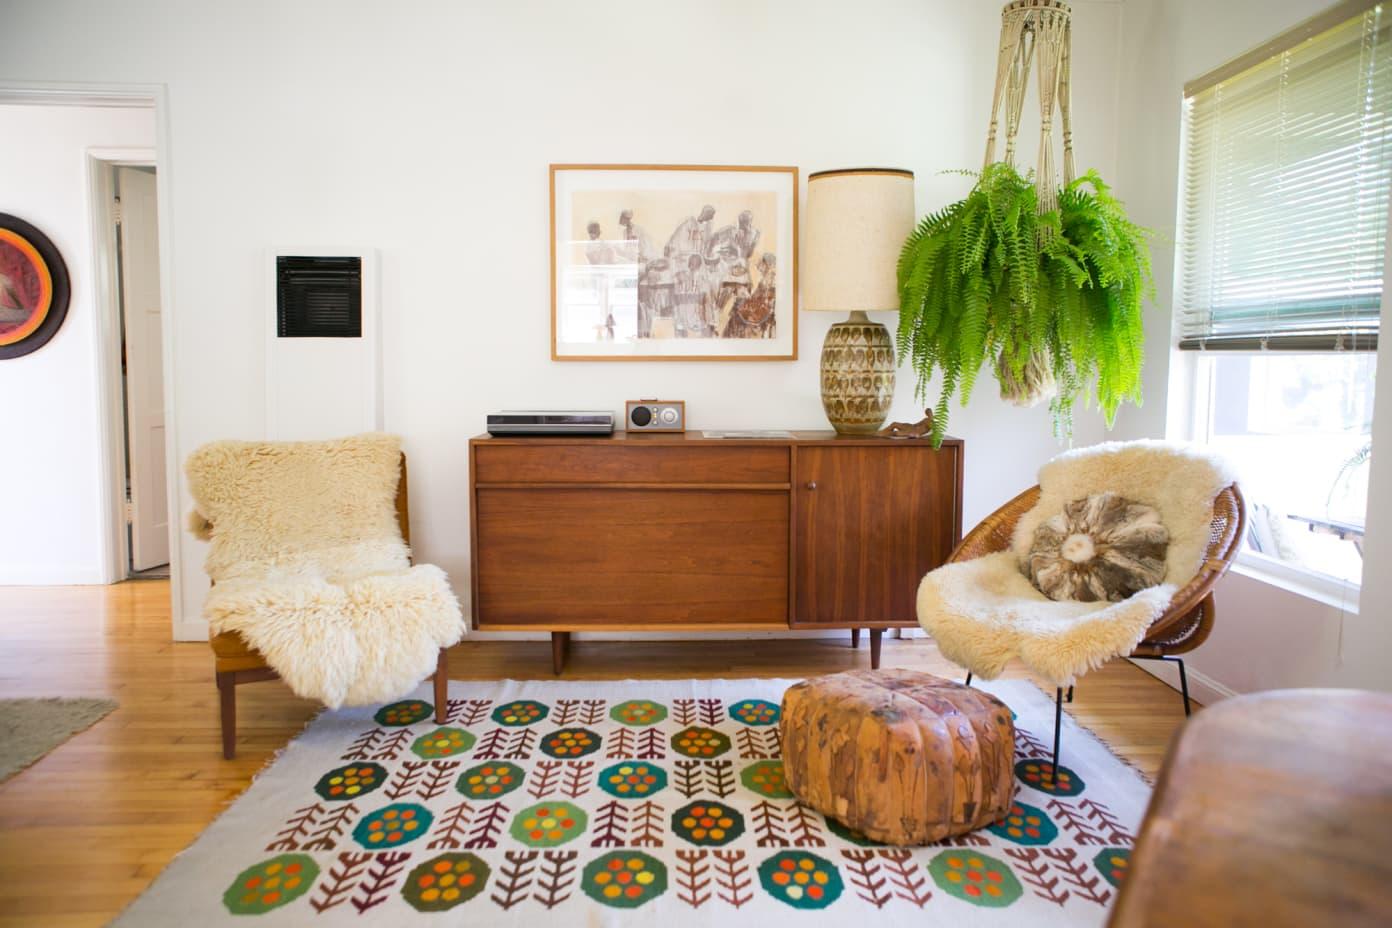 piante-ricadenti-casa-felce